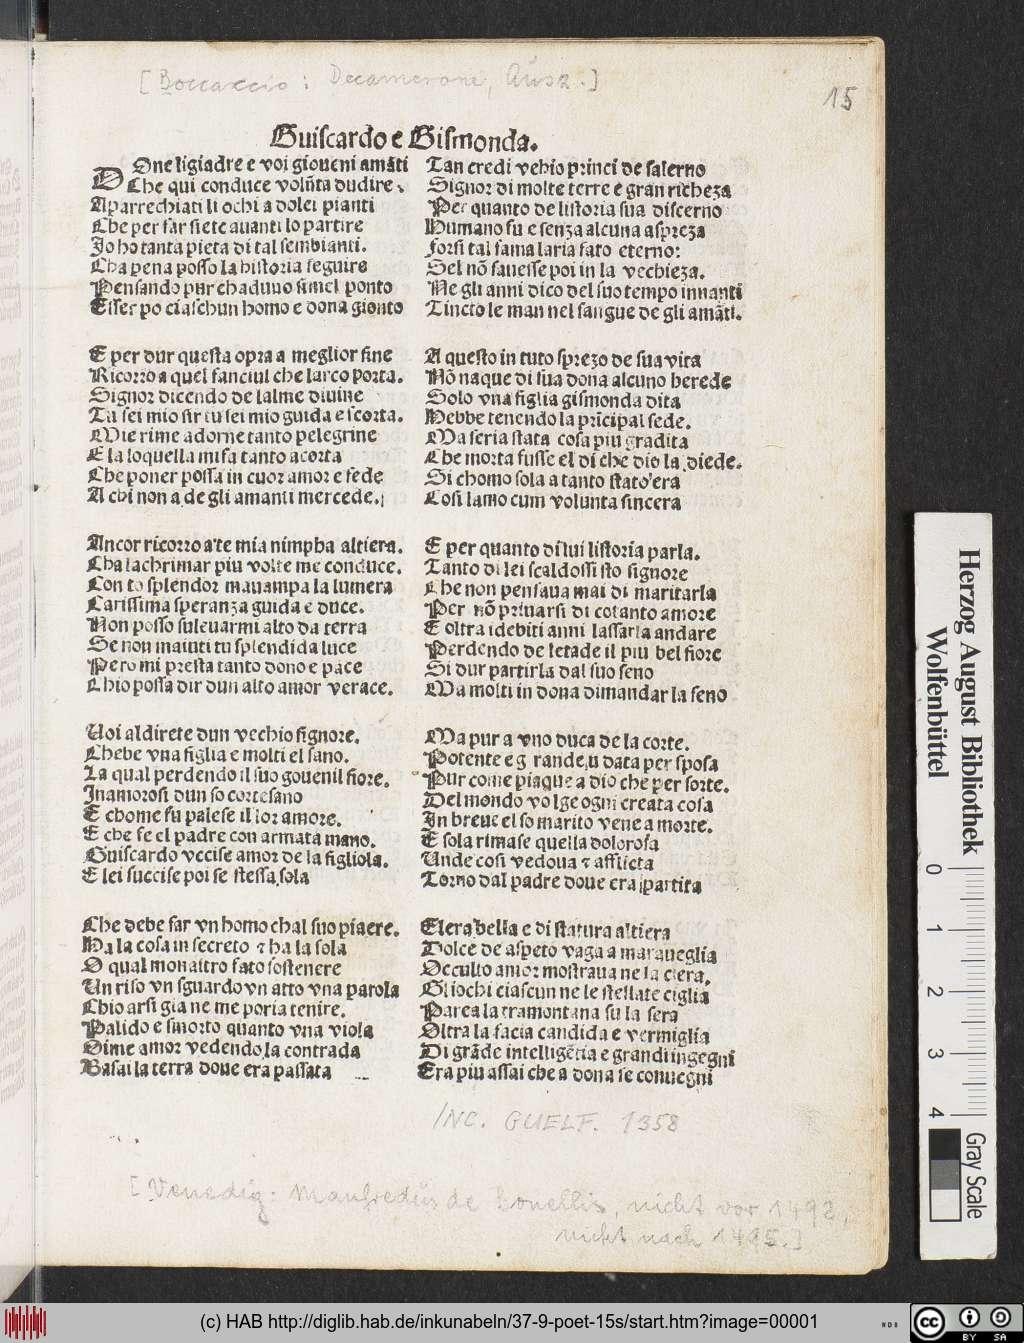 http://diglib.hab.de/inkunabeln/37-9-poet-15s/00001.jpg